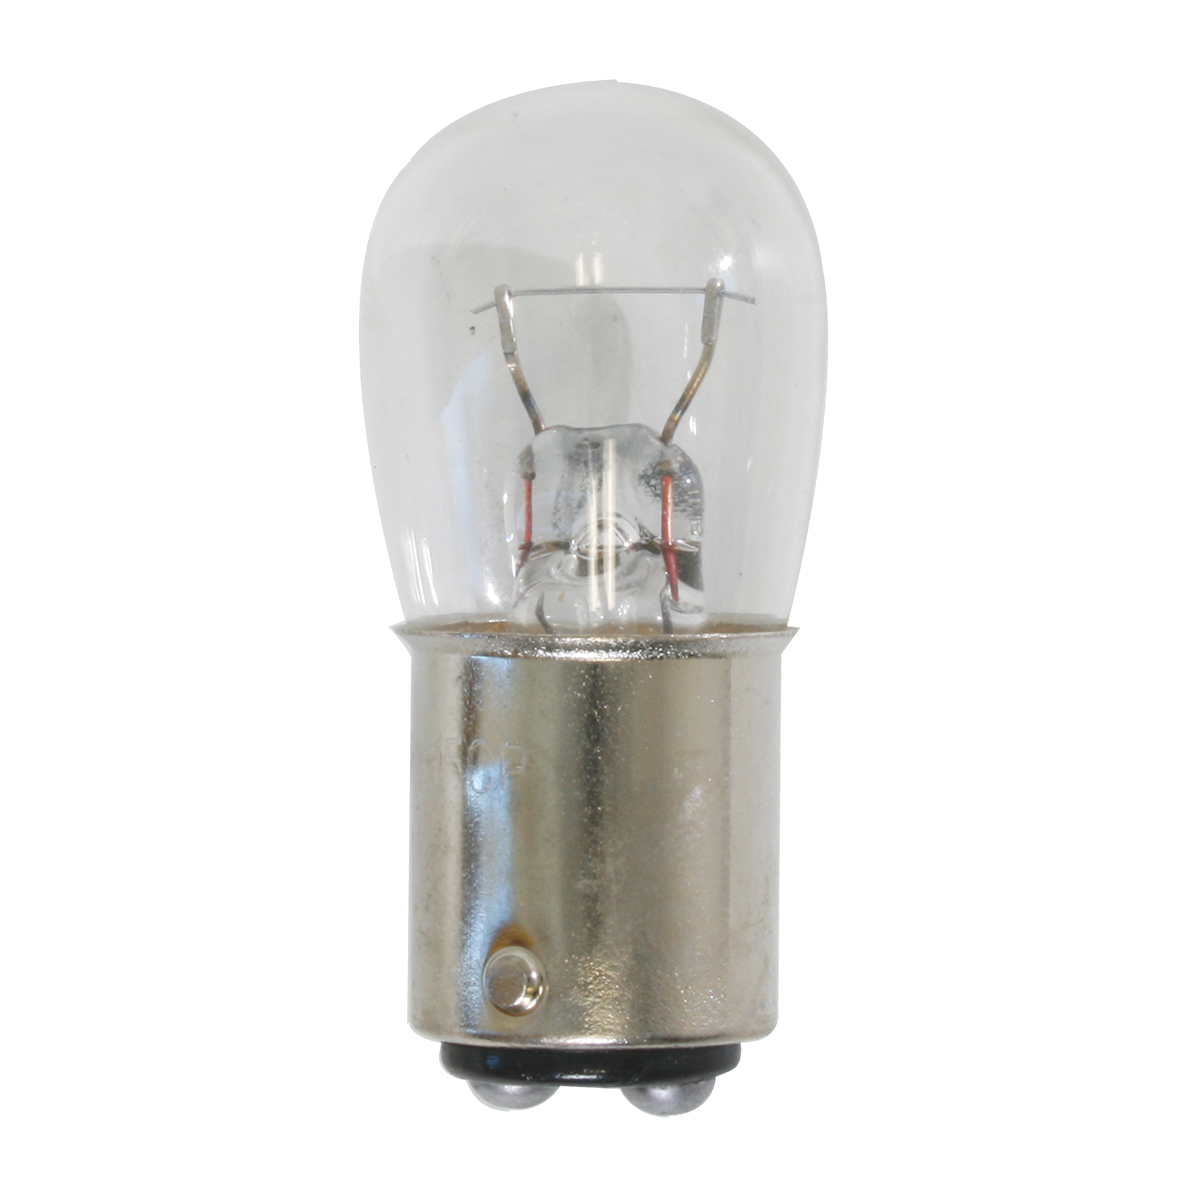 1004 Miniature Replacement Light Bulbs Grand General